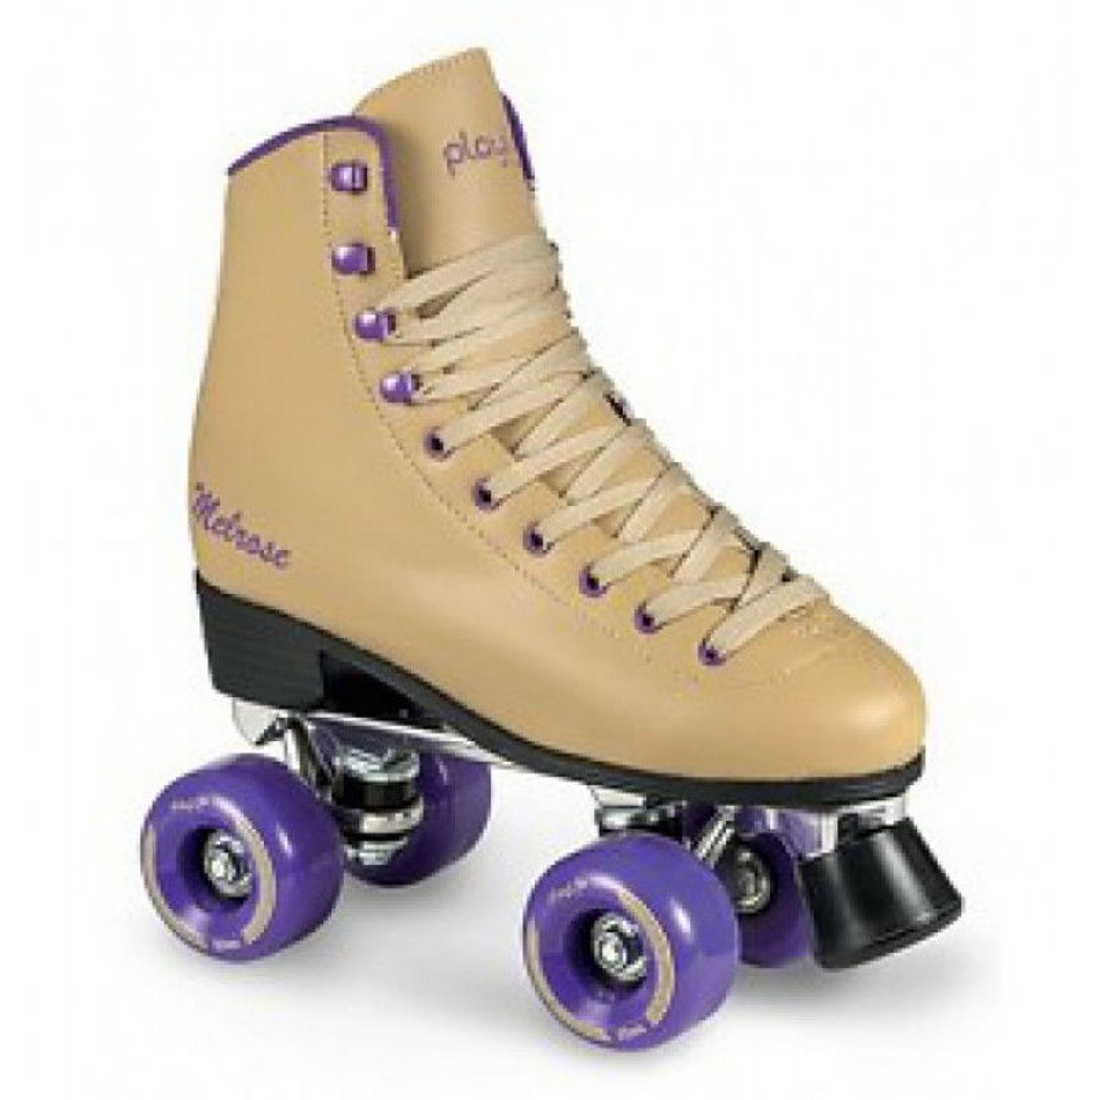 c0c763e7115 Roller Powerslide Melrose Ocker - quads pour femme - Achetez patins ...